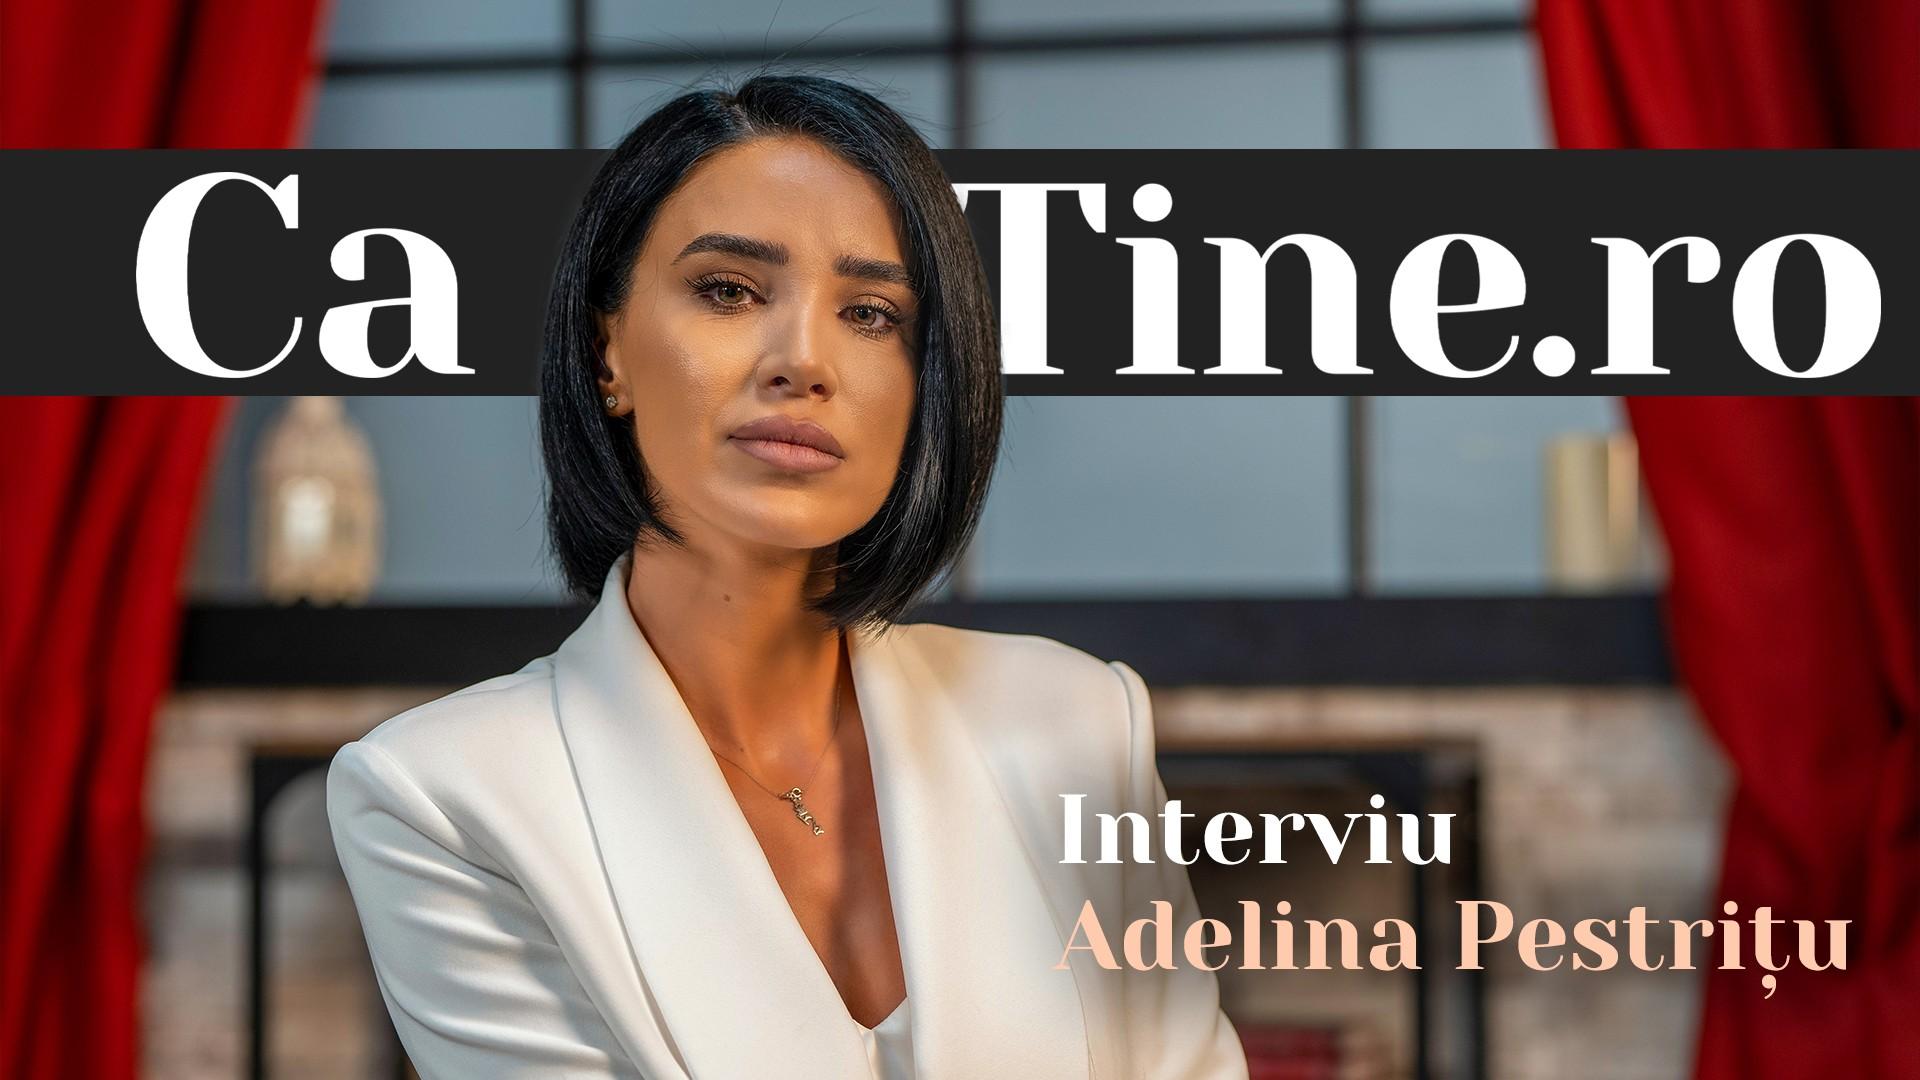 CaTine.ro - Interviu - Adelina Pestrițu - Independentă